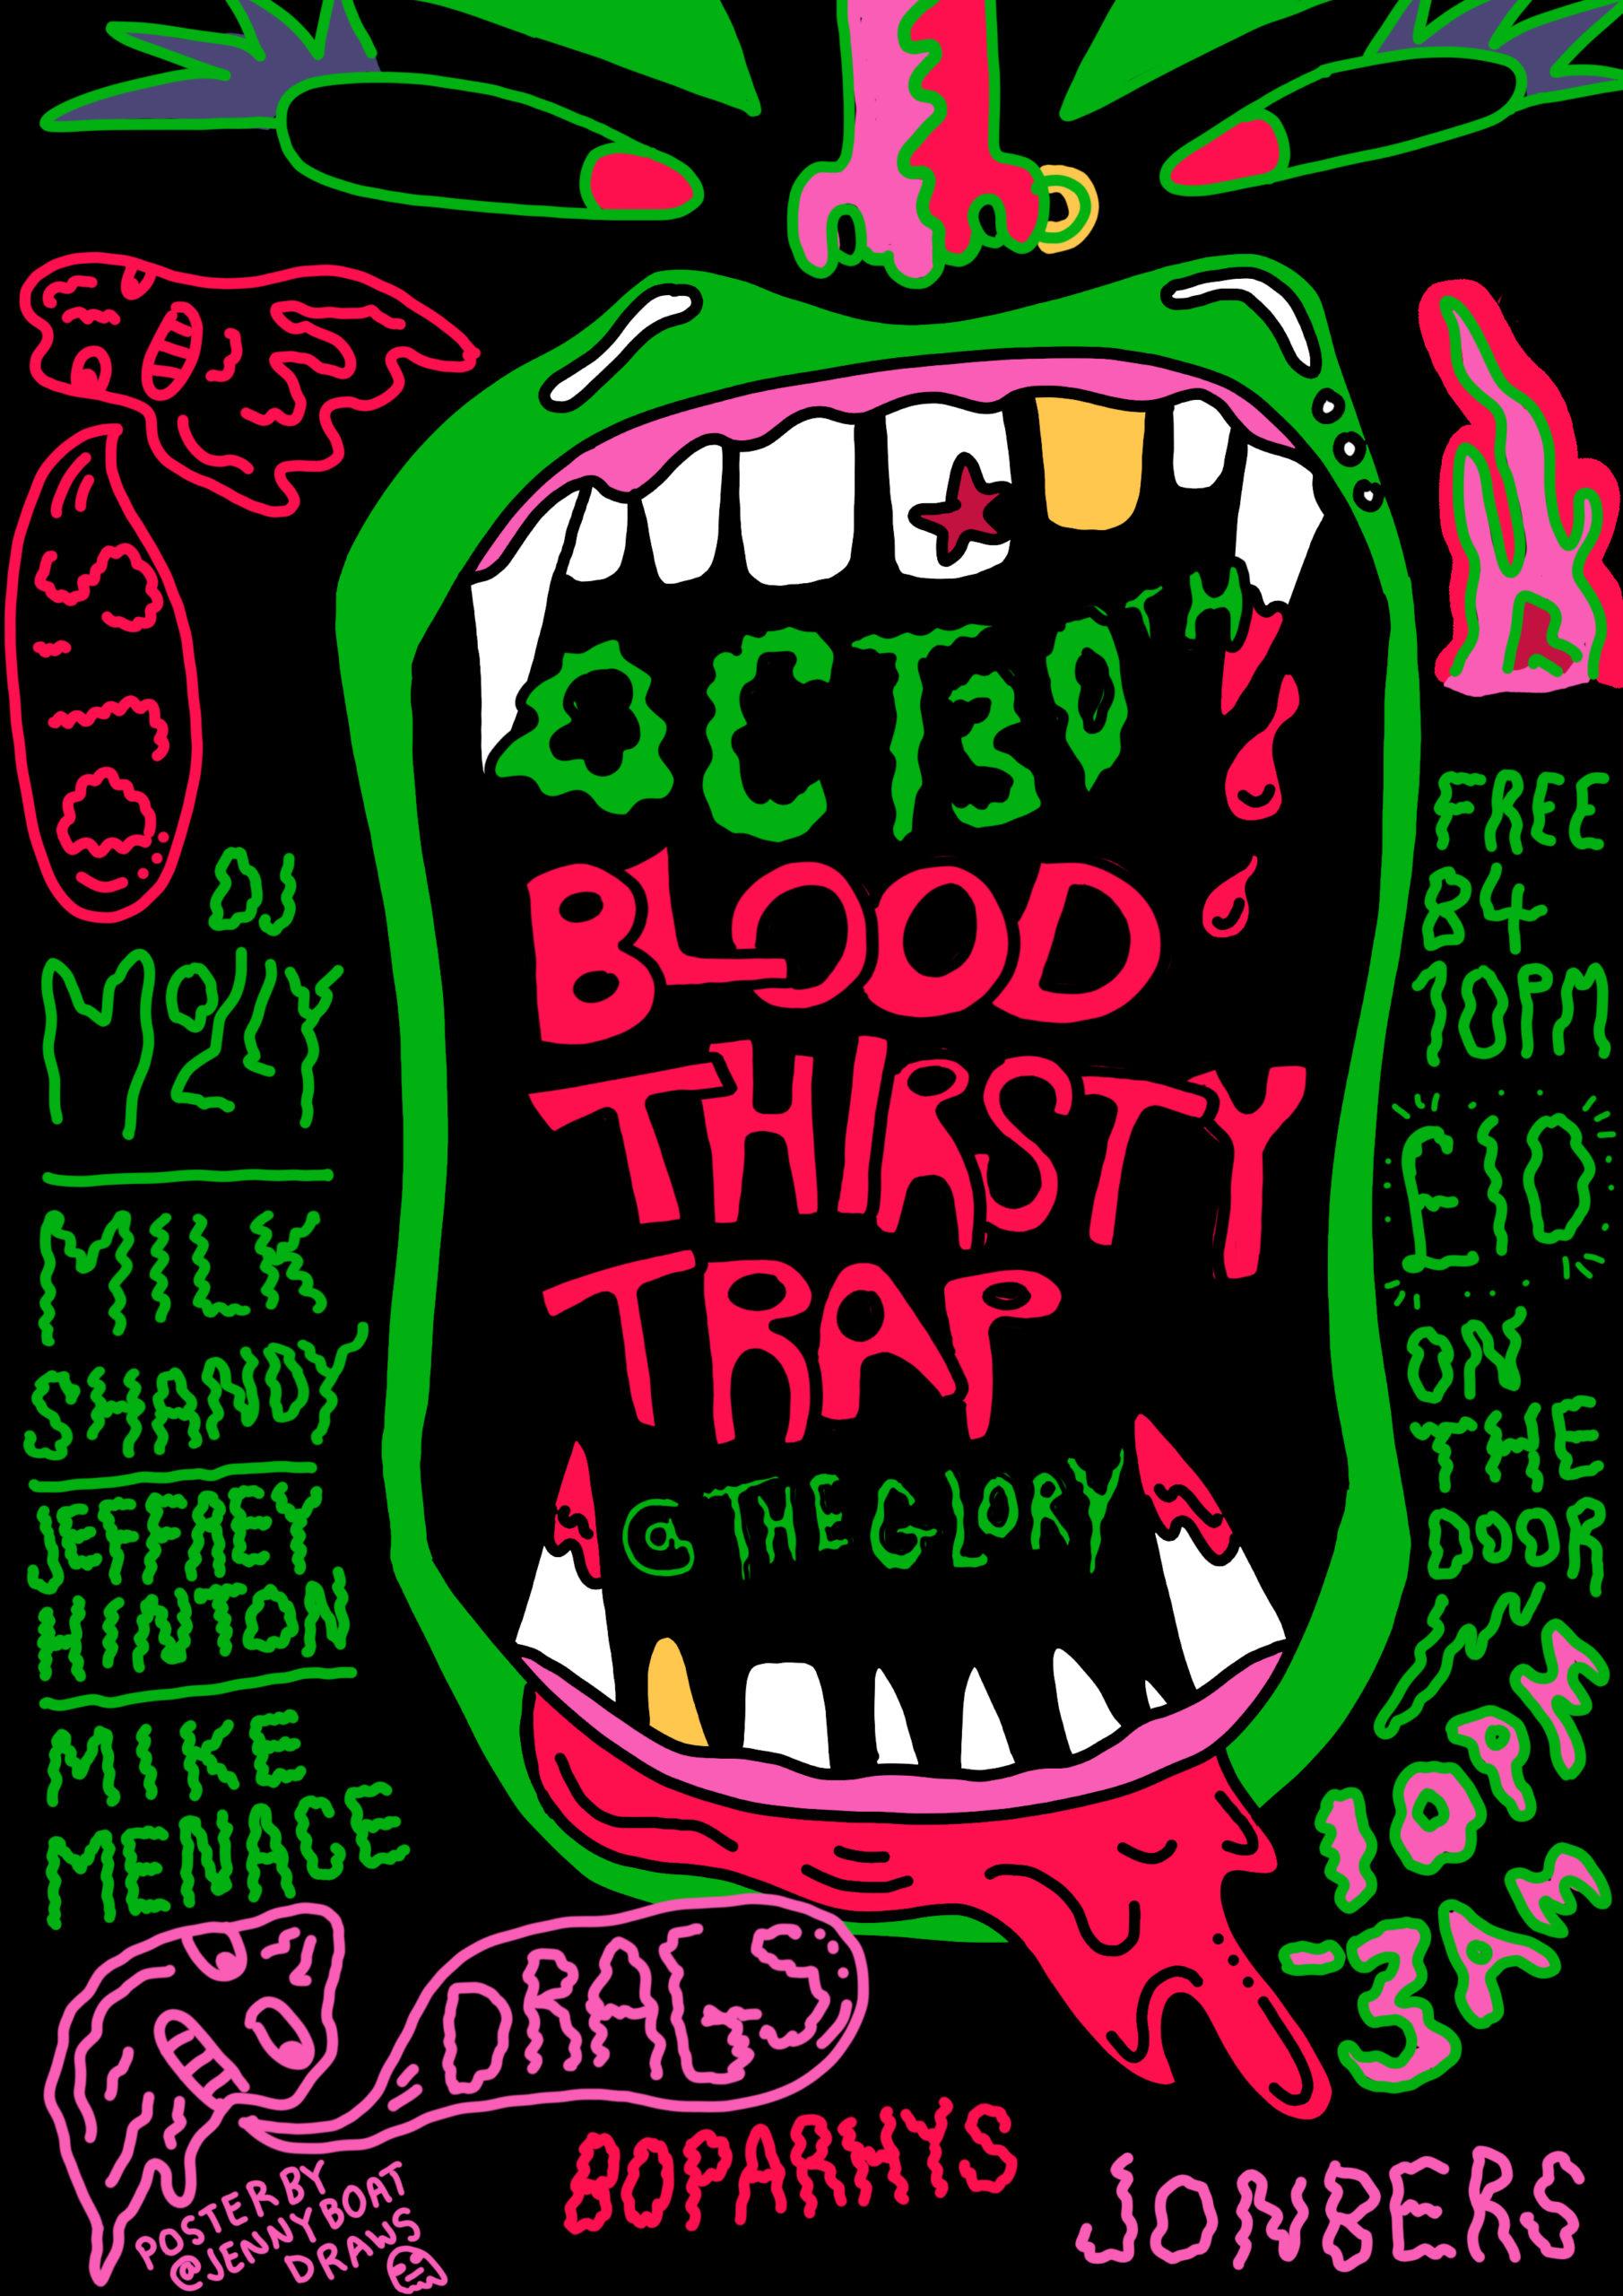 Blood Thirsty Trap